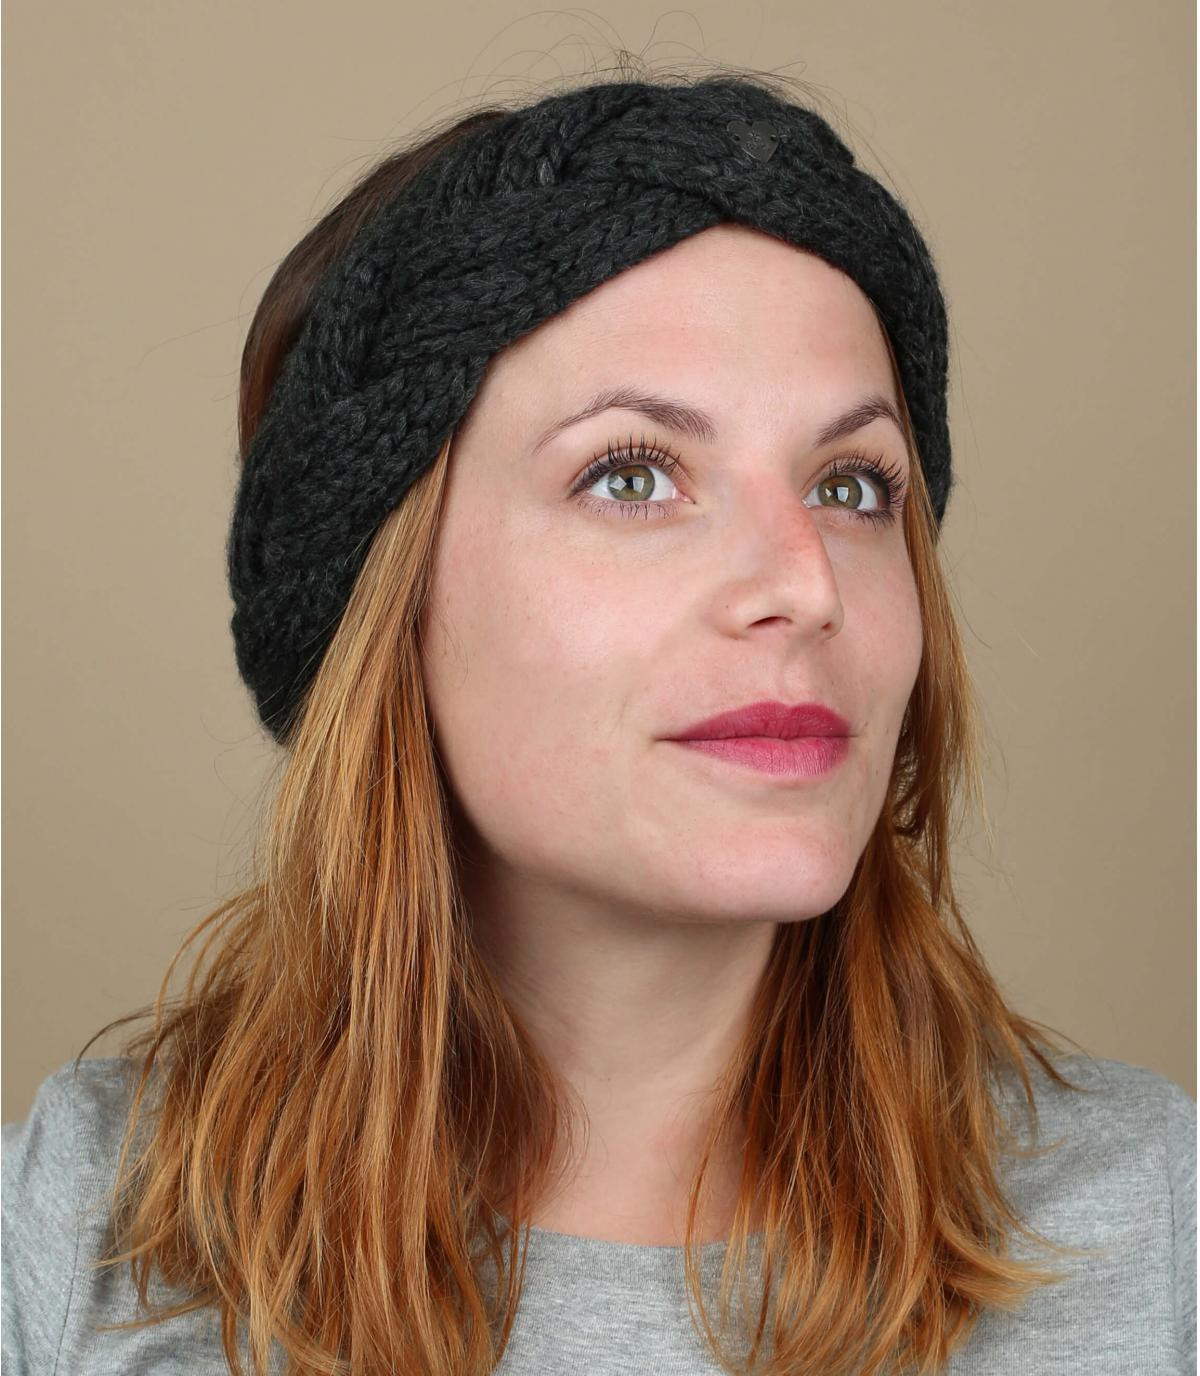 Grijze plaited hoofdband